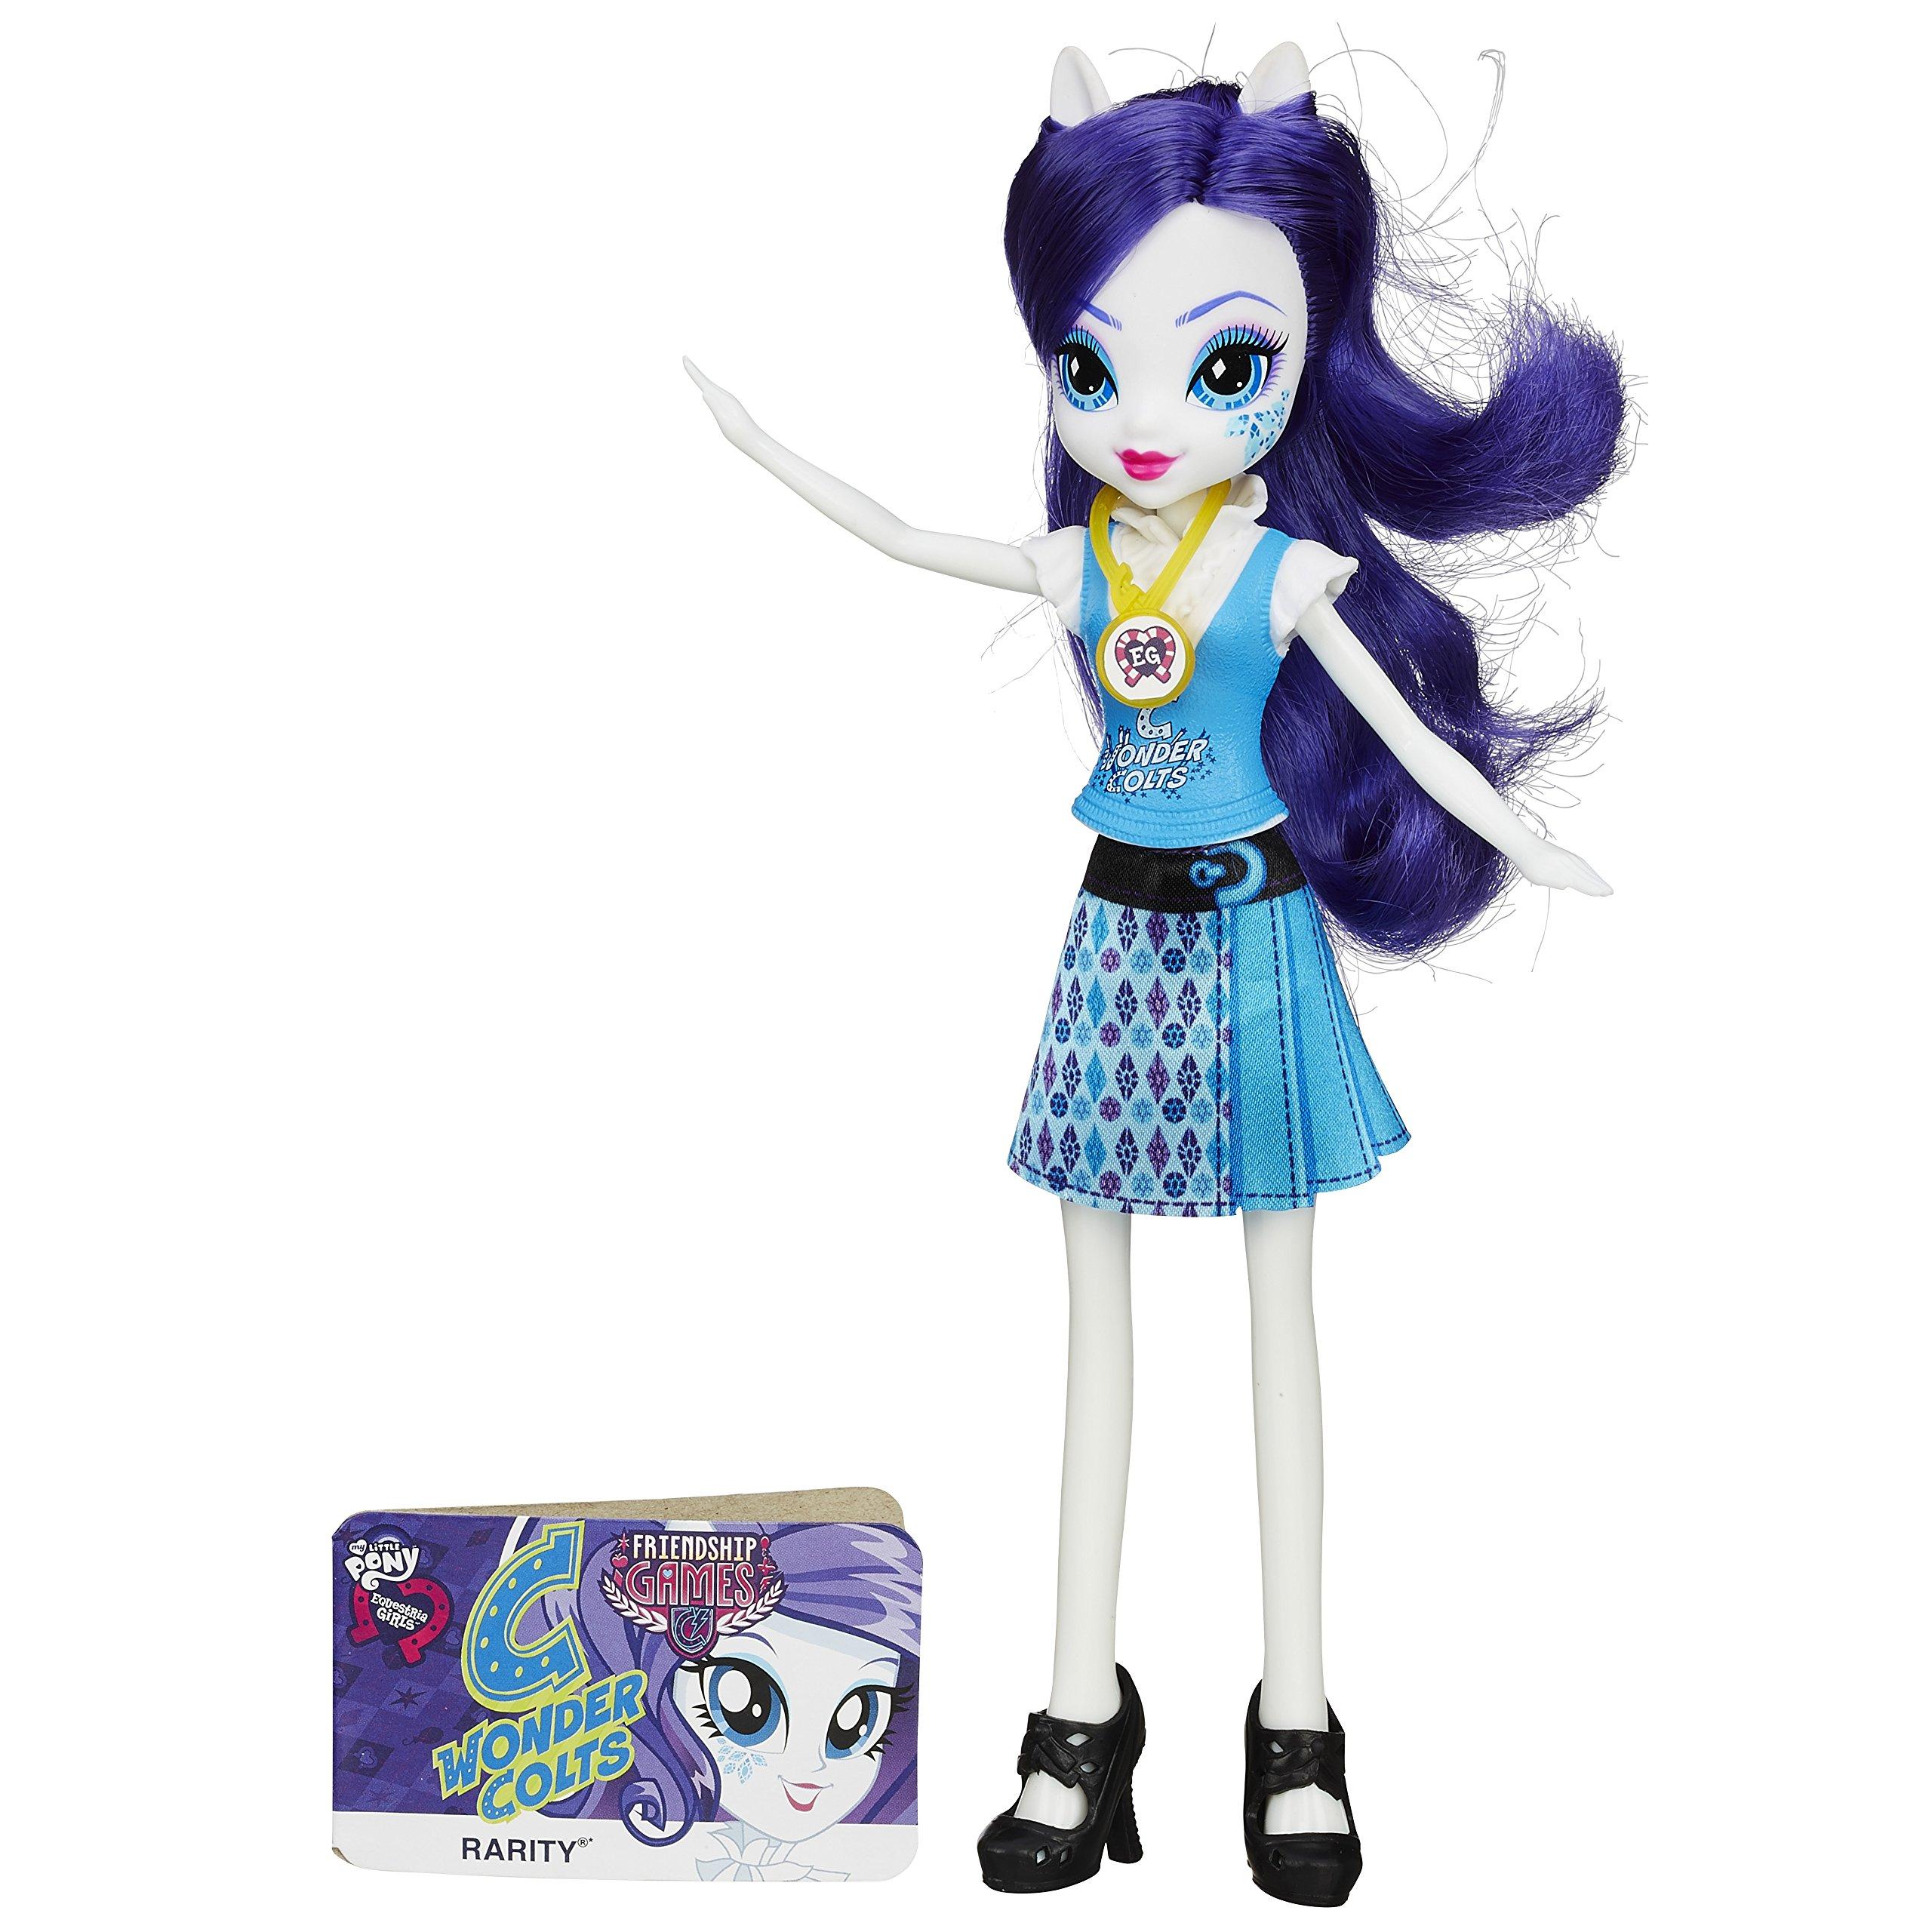 My little pony equestria girl dolls fluttershy - photo#55